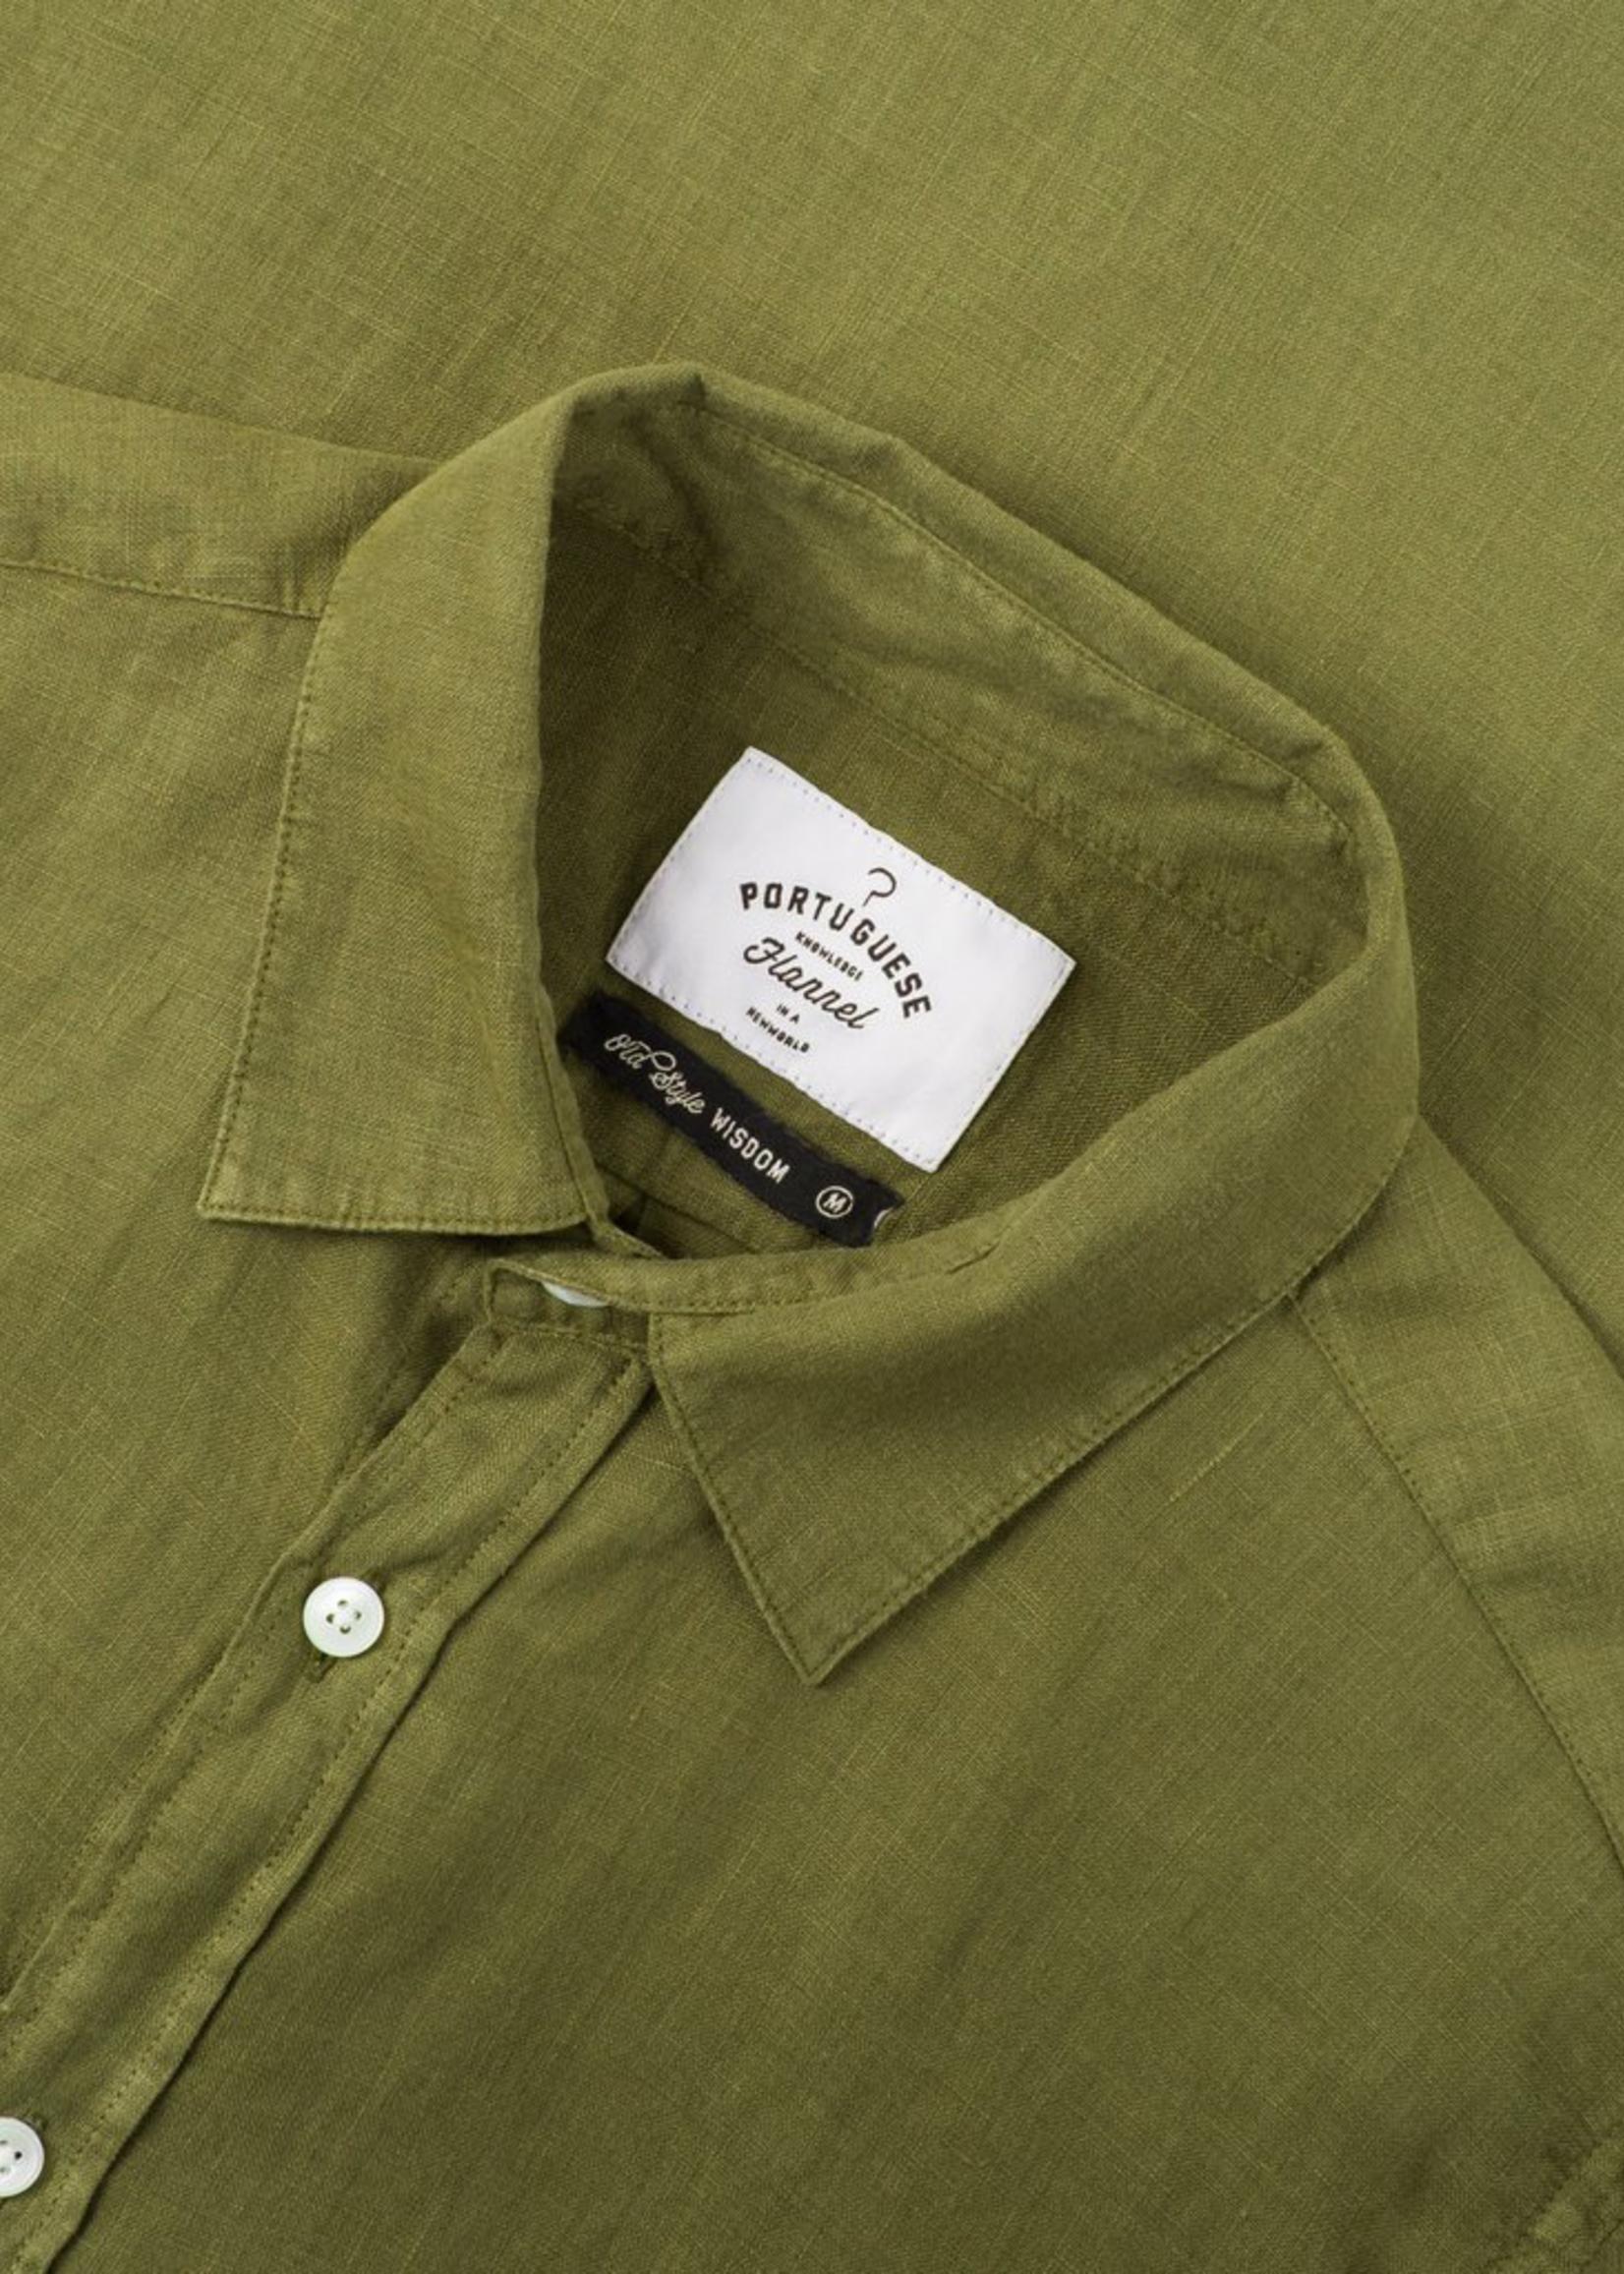 Portuguese Flannel Linen L/S Shirt Olive by Portuguese Flannel